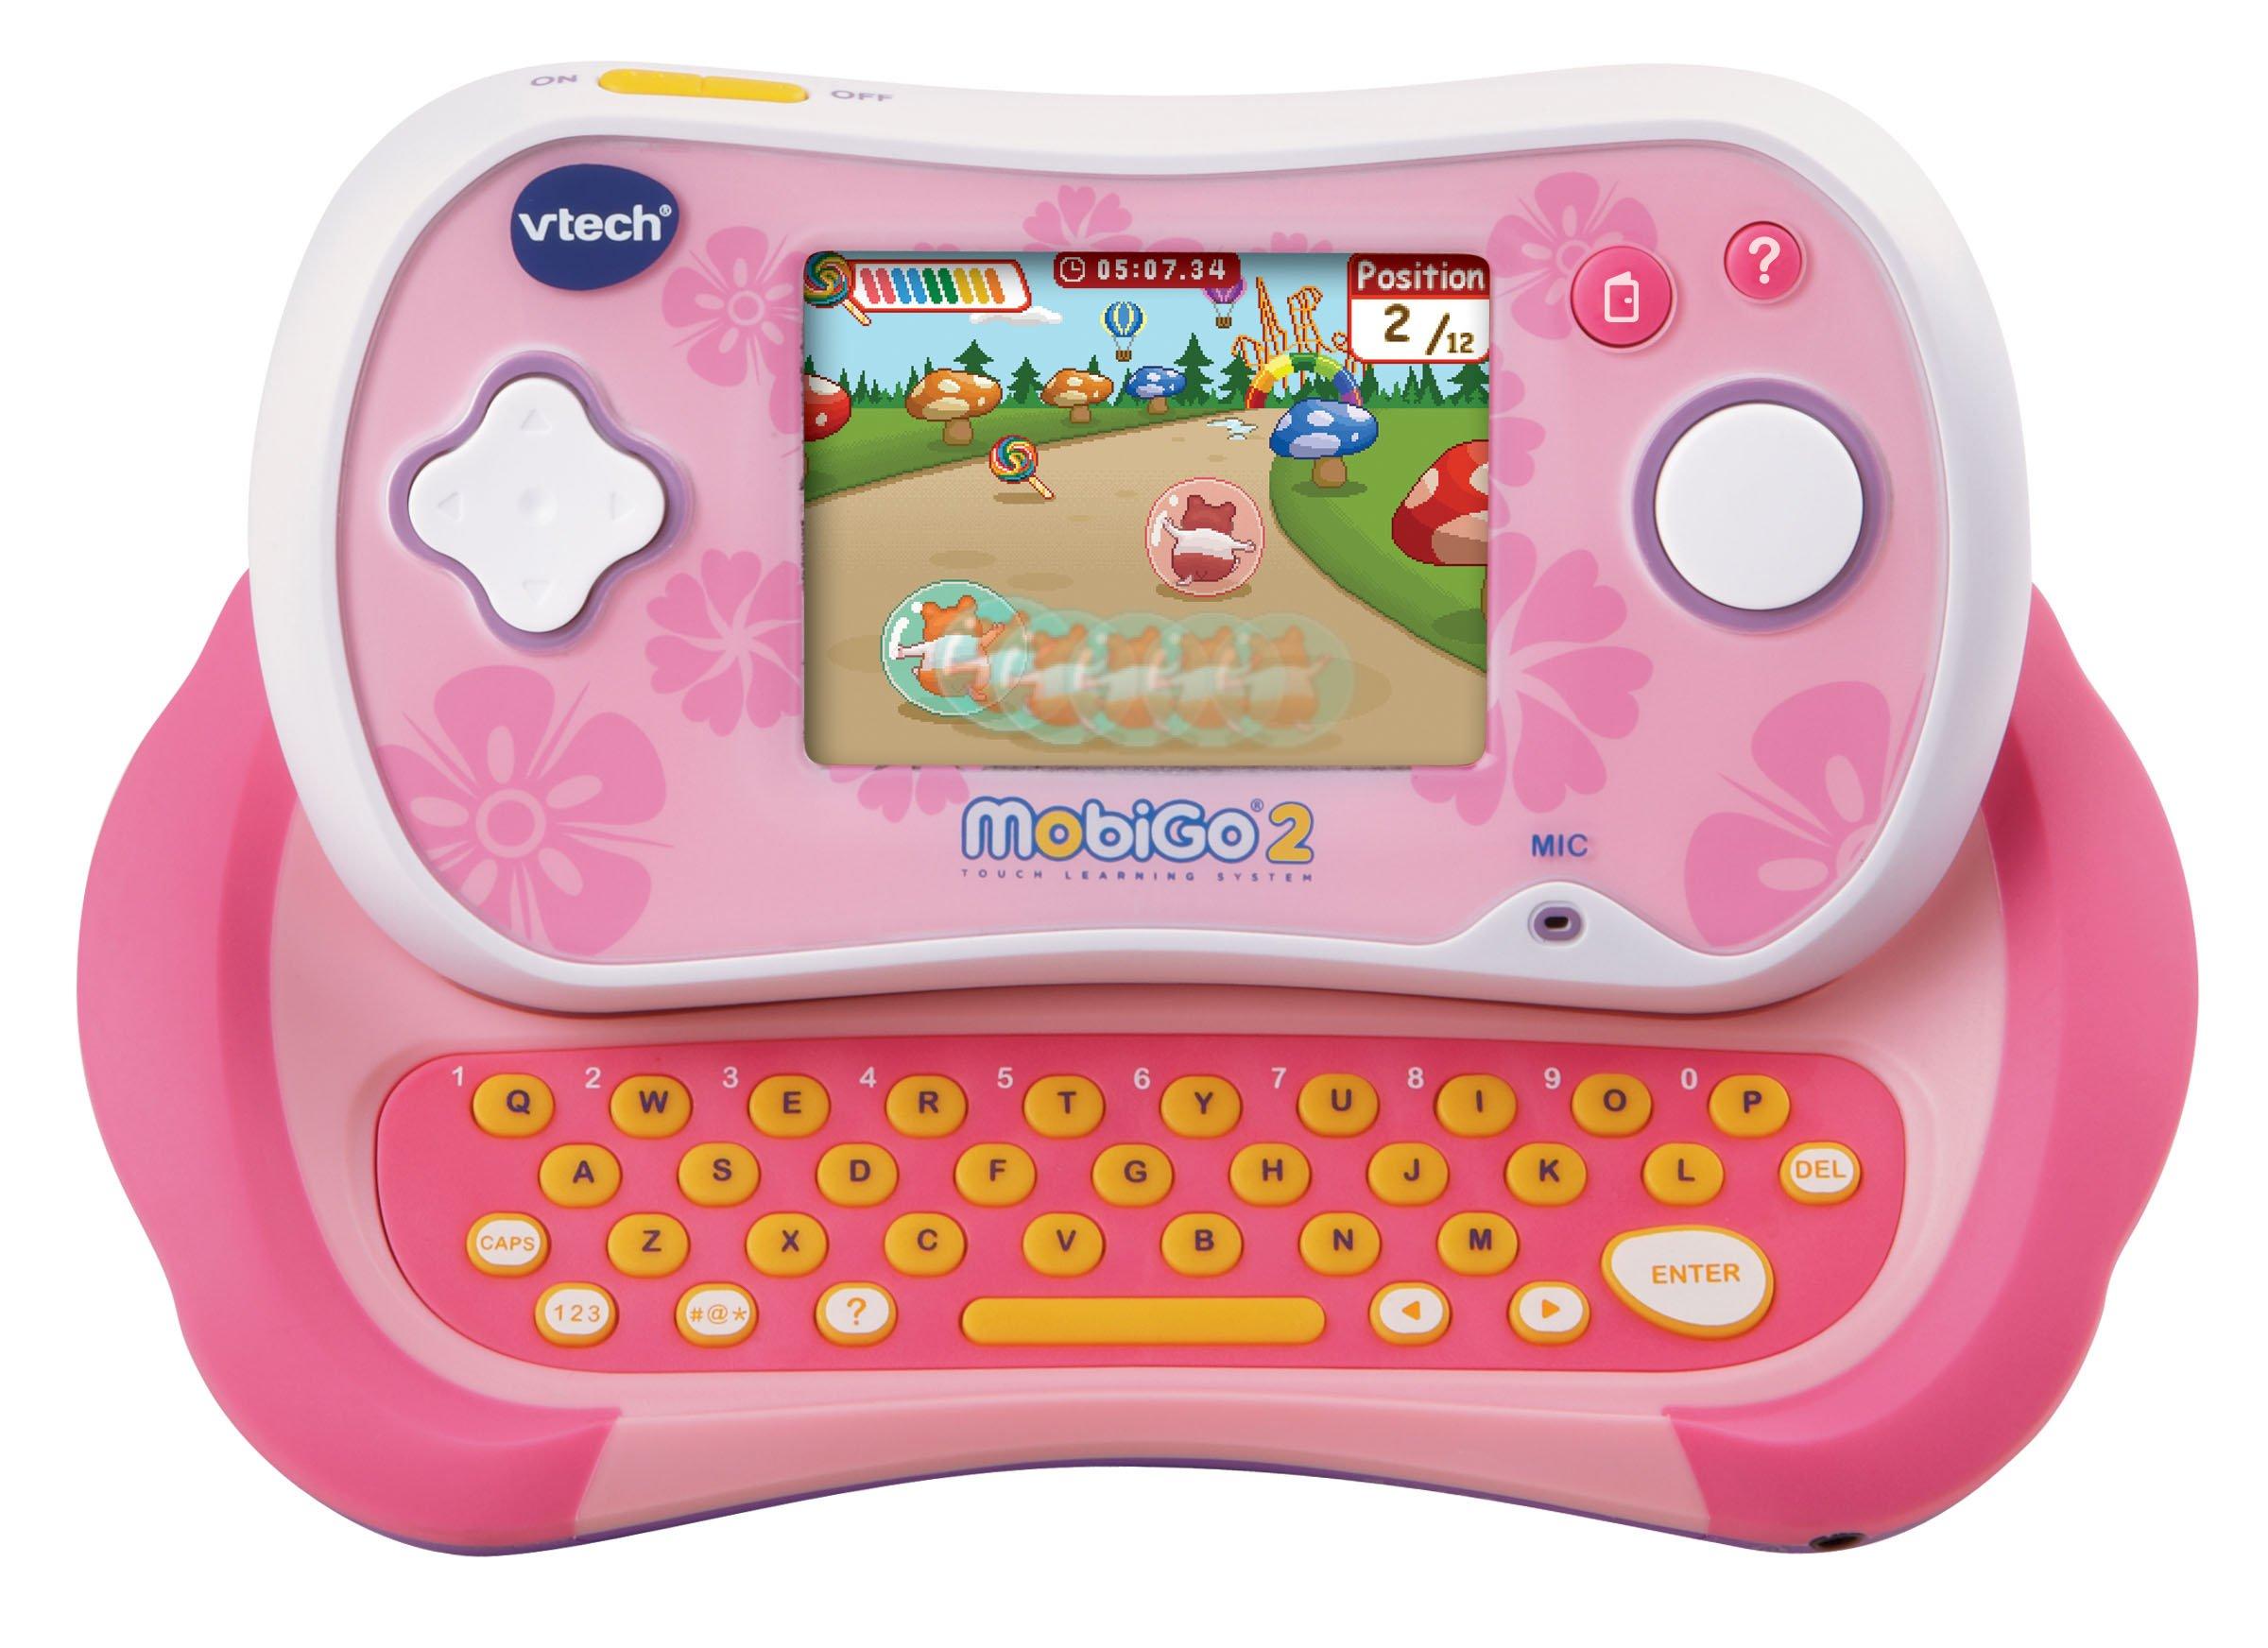 VTech MobiGo 2 Touch Learning System - Pink by VTech (Image #5)